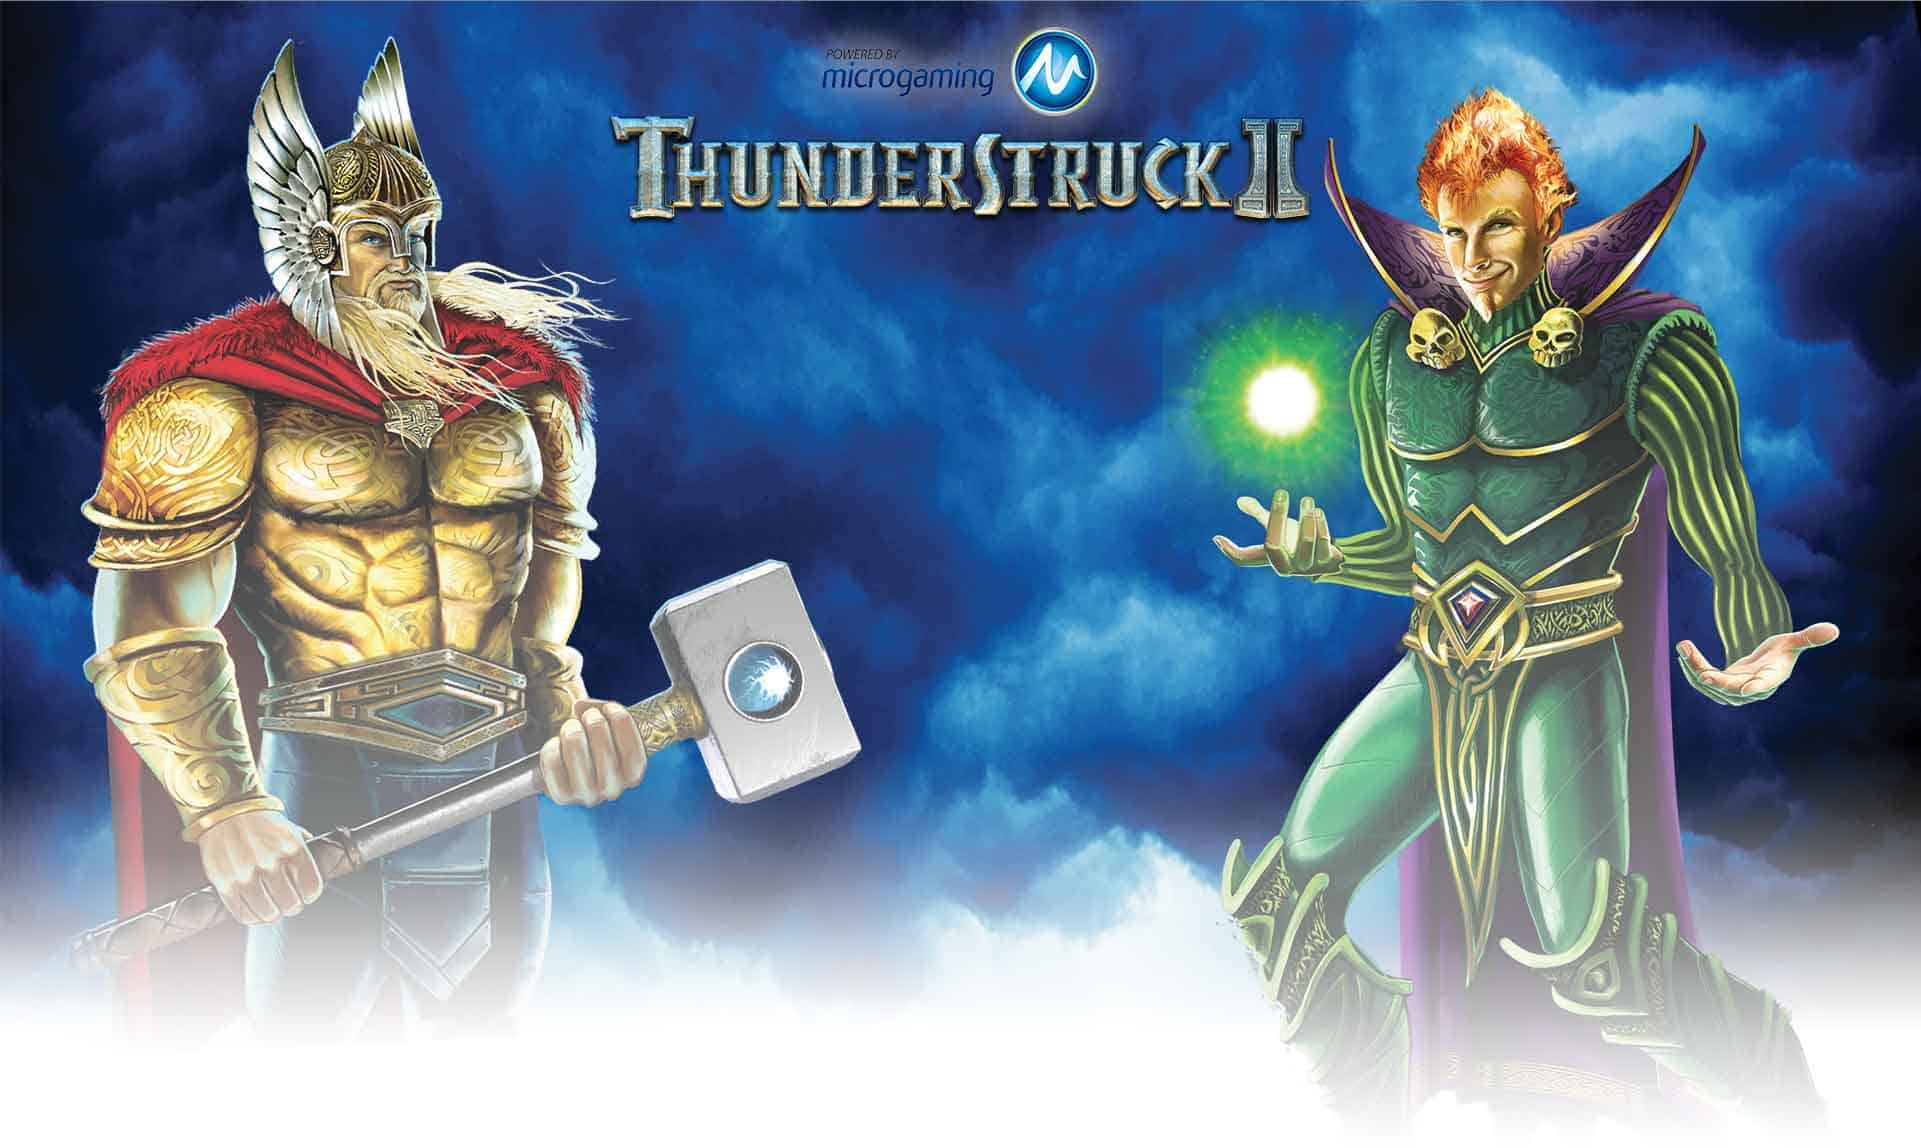 Thunderstruck 2 Microgaming